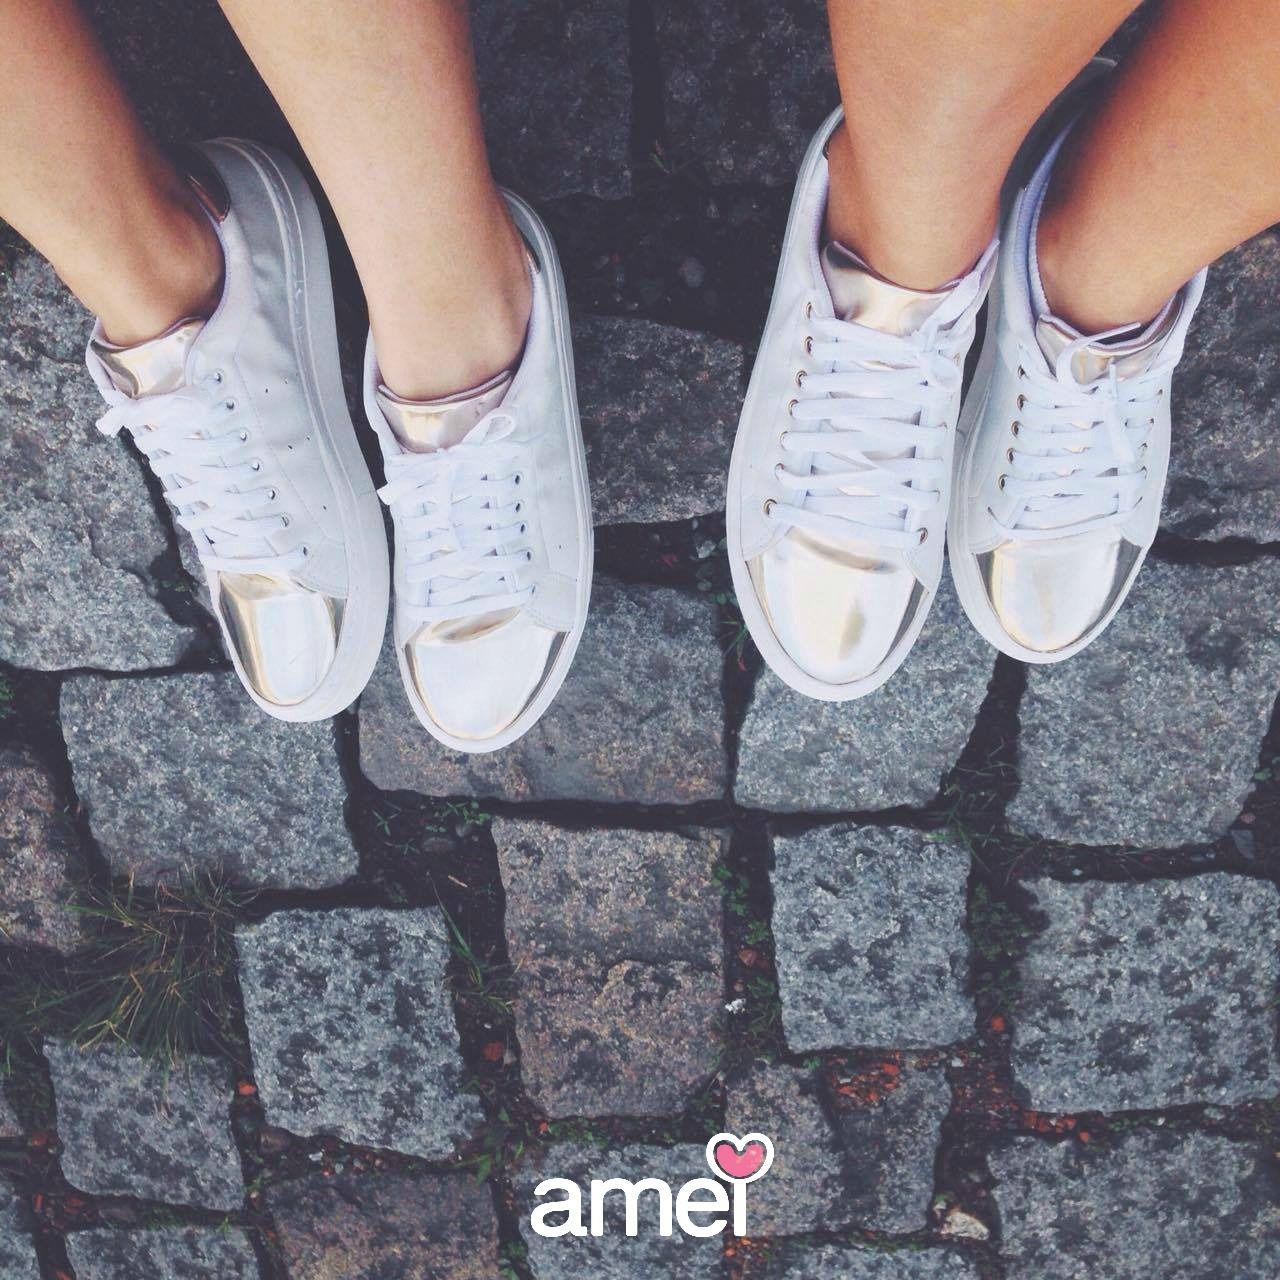 Branco e dourado ✨ #lojaamei #etiquetaamei #tenisbranco #dourado #trend #verao #calçado #pes